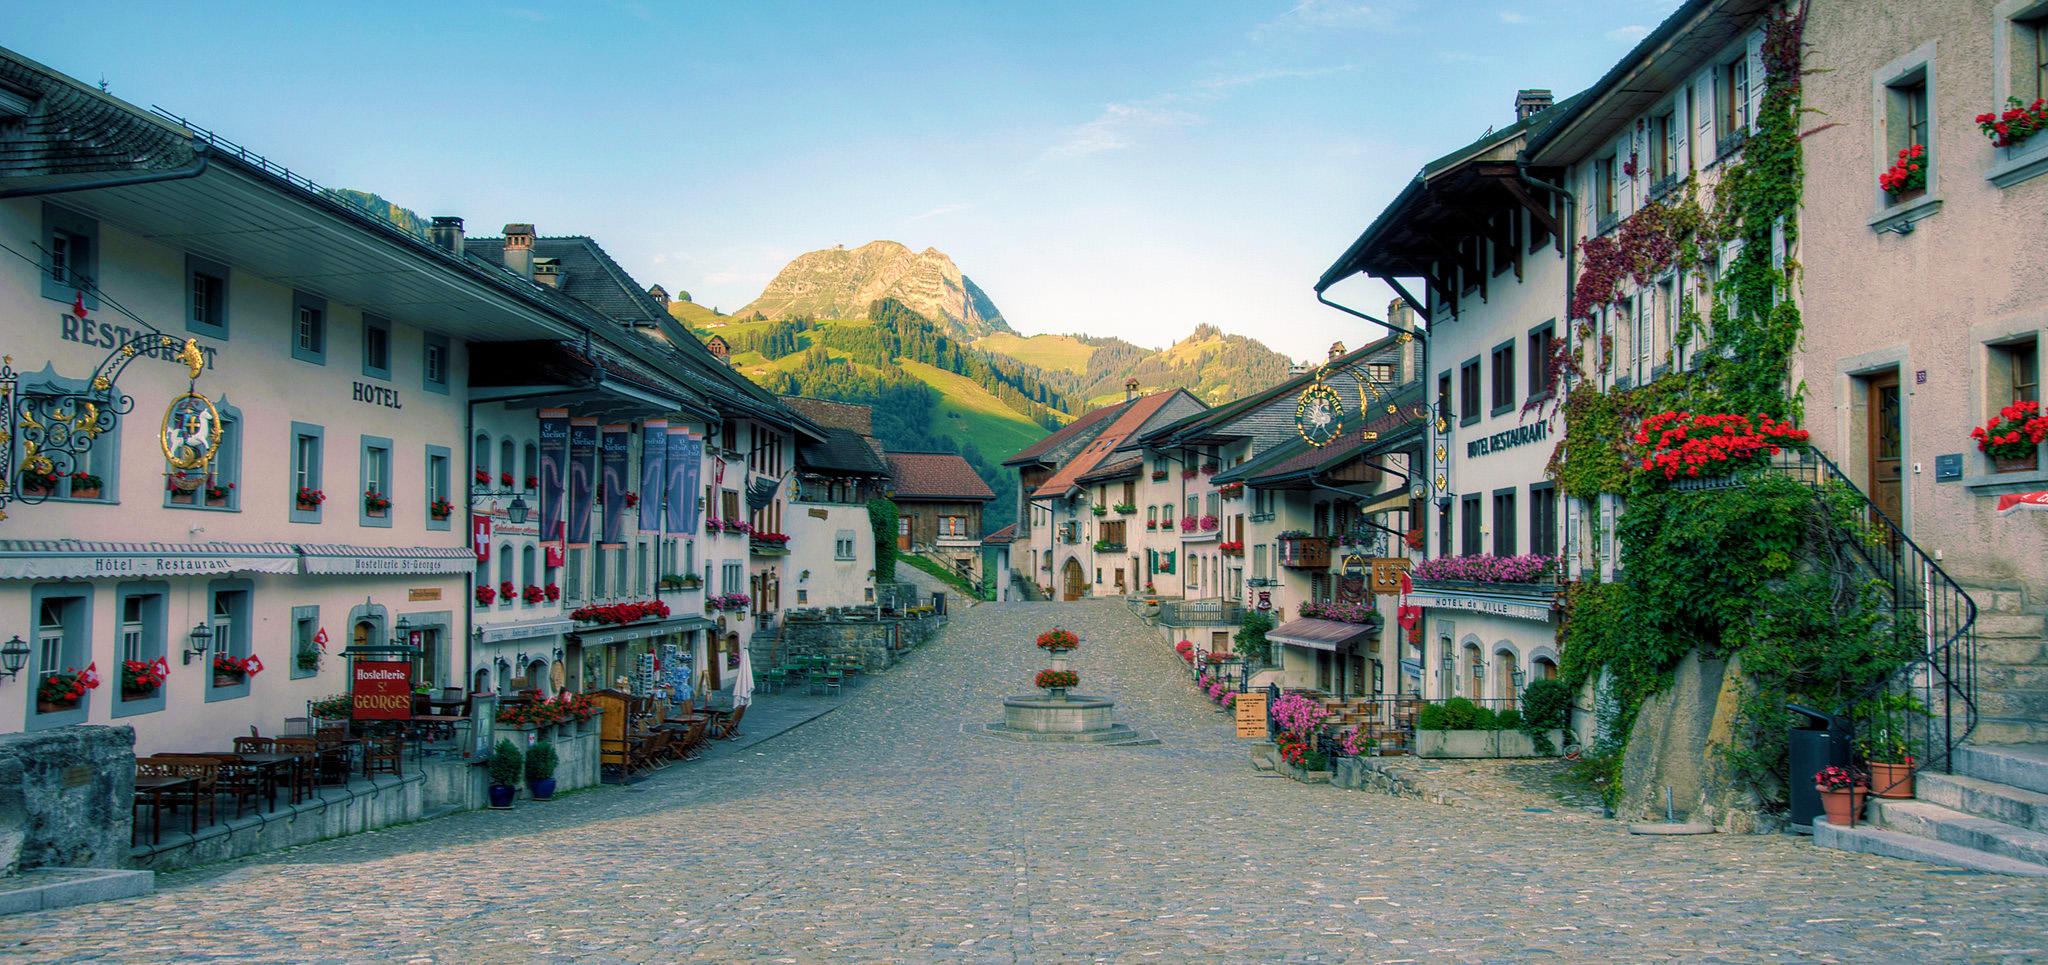 kt_2020_350_Keytours_excursions_Swisstours_gruyères_village3_2048_10